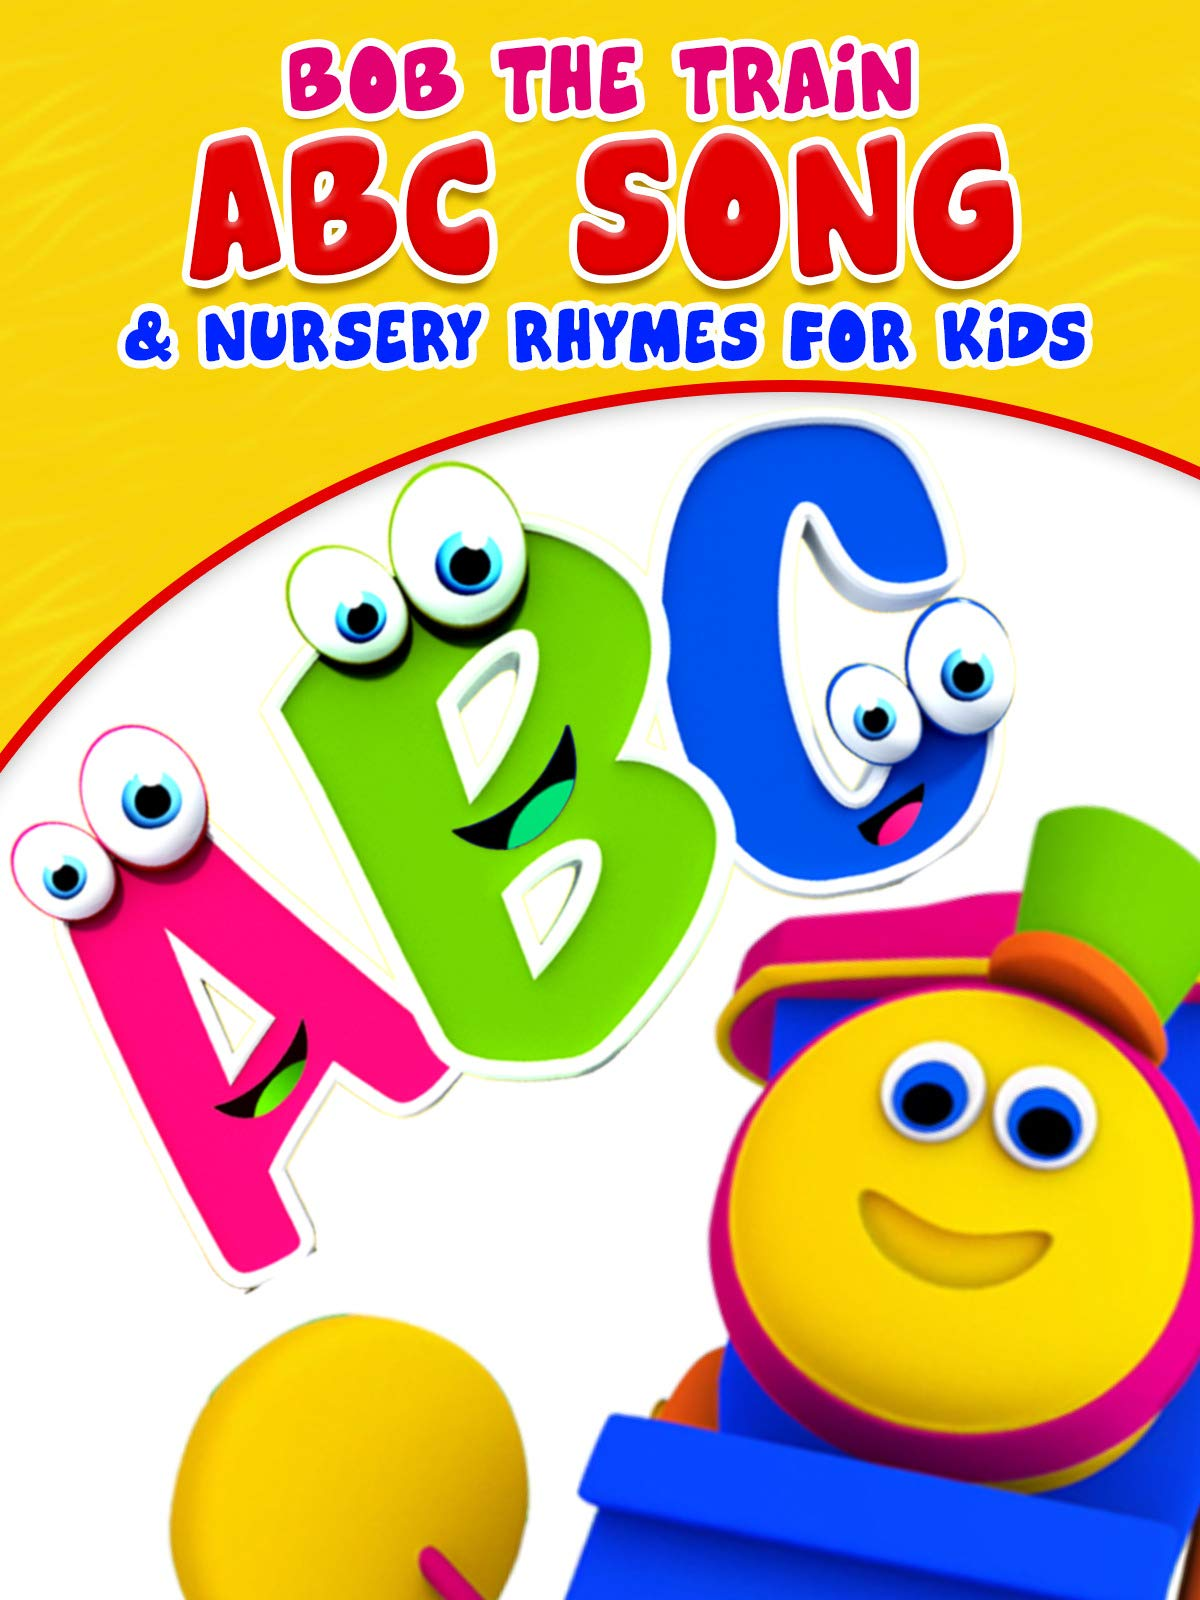 ABC Song & Nursery Rhymes for Kids - Bob the Train